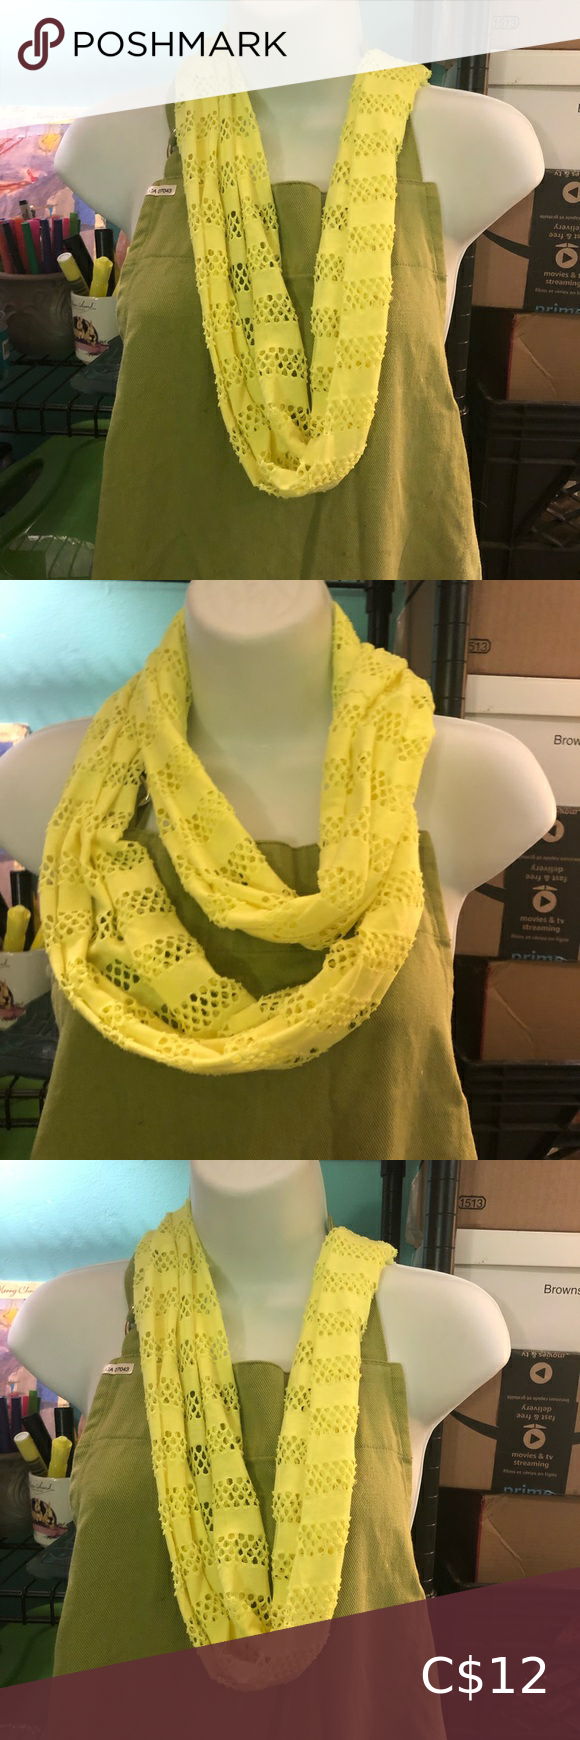 Photo of Neon yellow infinity scarf